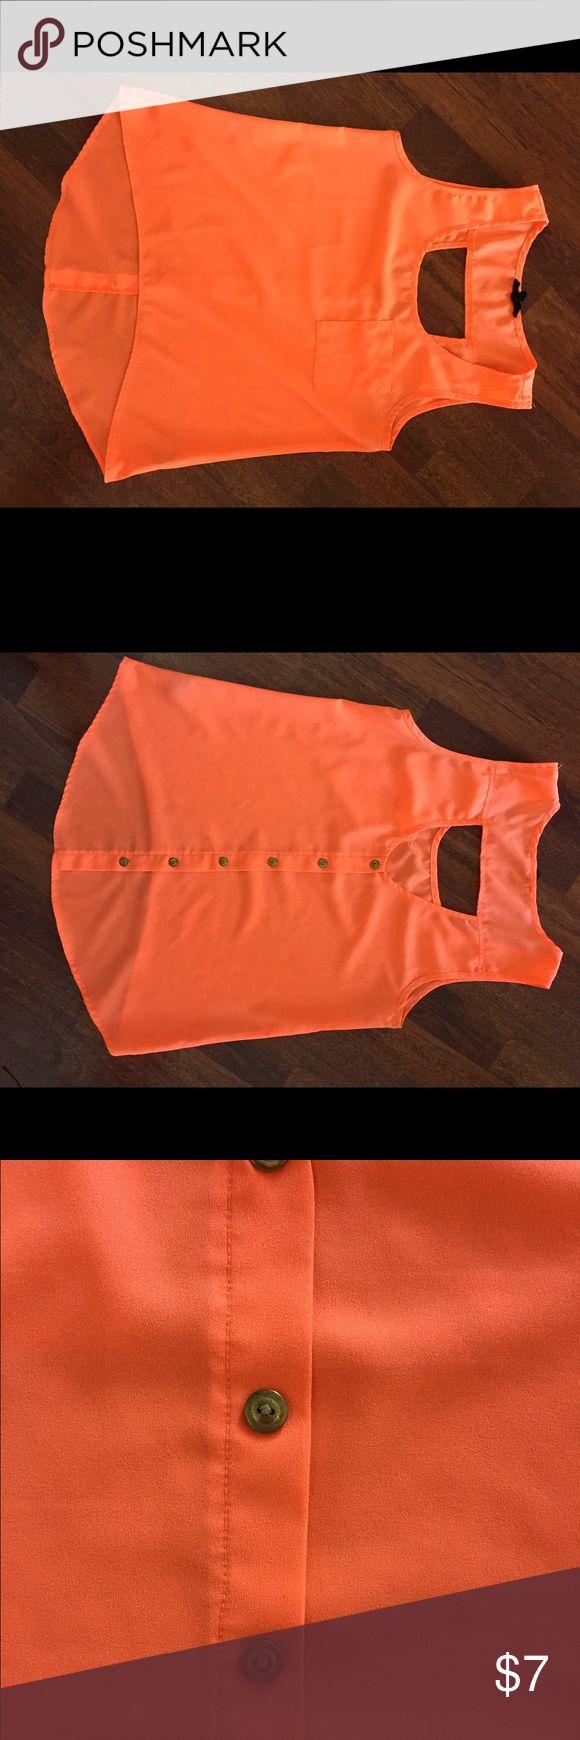 Bright Orange Dress Shirt Brass buttons down back! Great work shirt! Tops Blouses